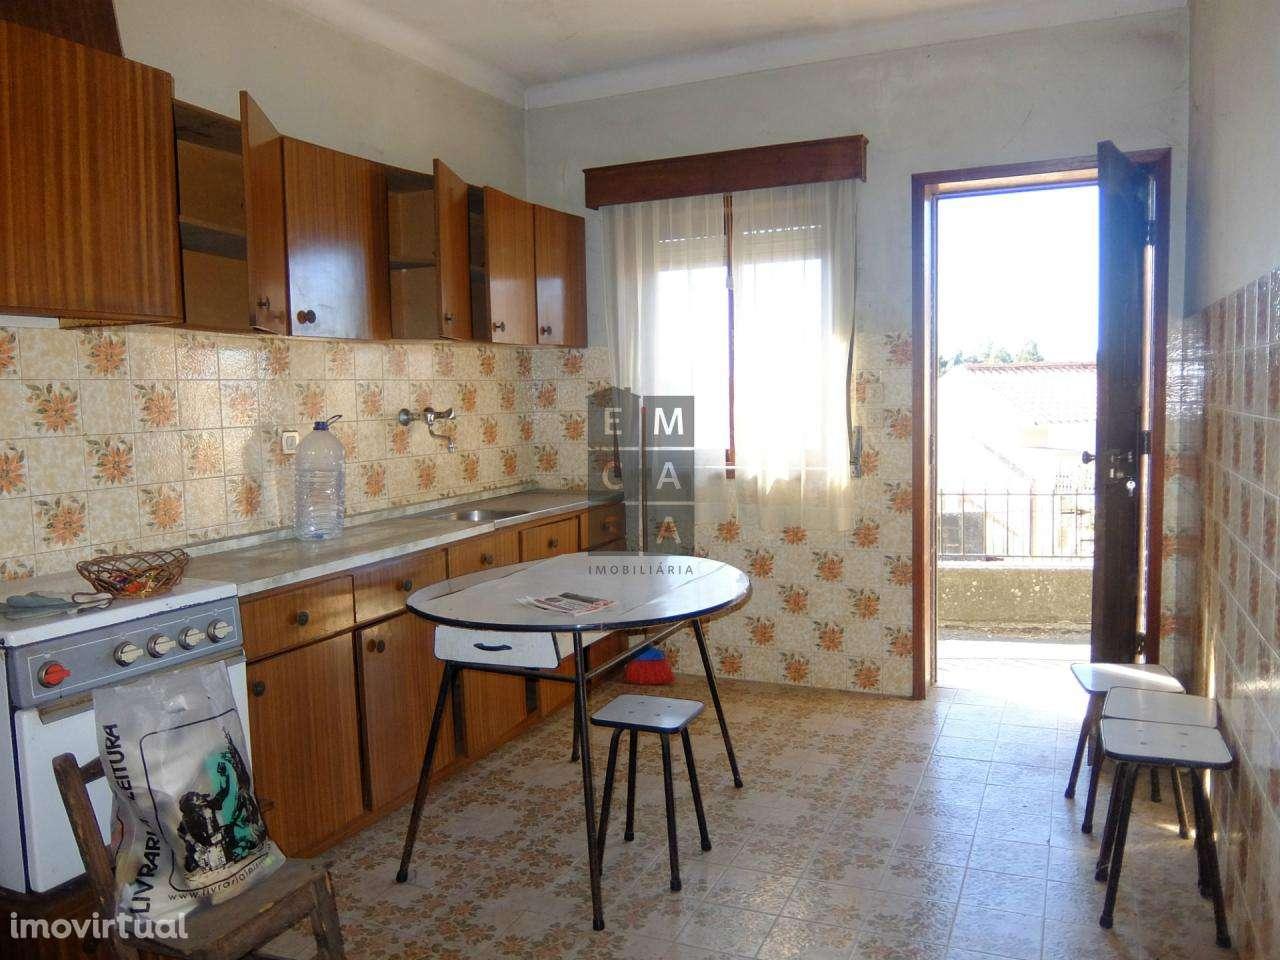 Moradia para comprar, Oliveira de Azeméis, Santiago de Riba-Ul, Ul, Macinhata da Seixa e Madail, Oliveira de Azeméis, Aveiro - Foto 6